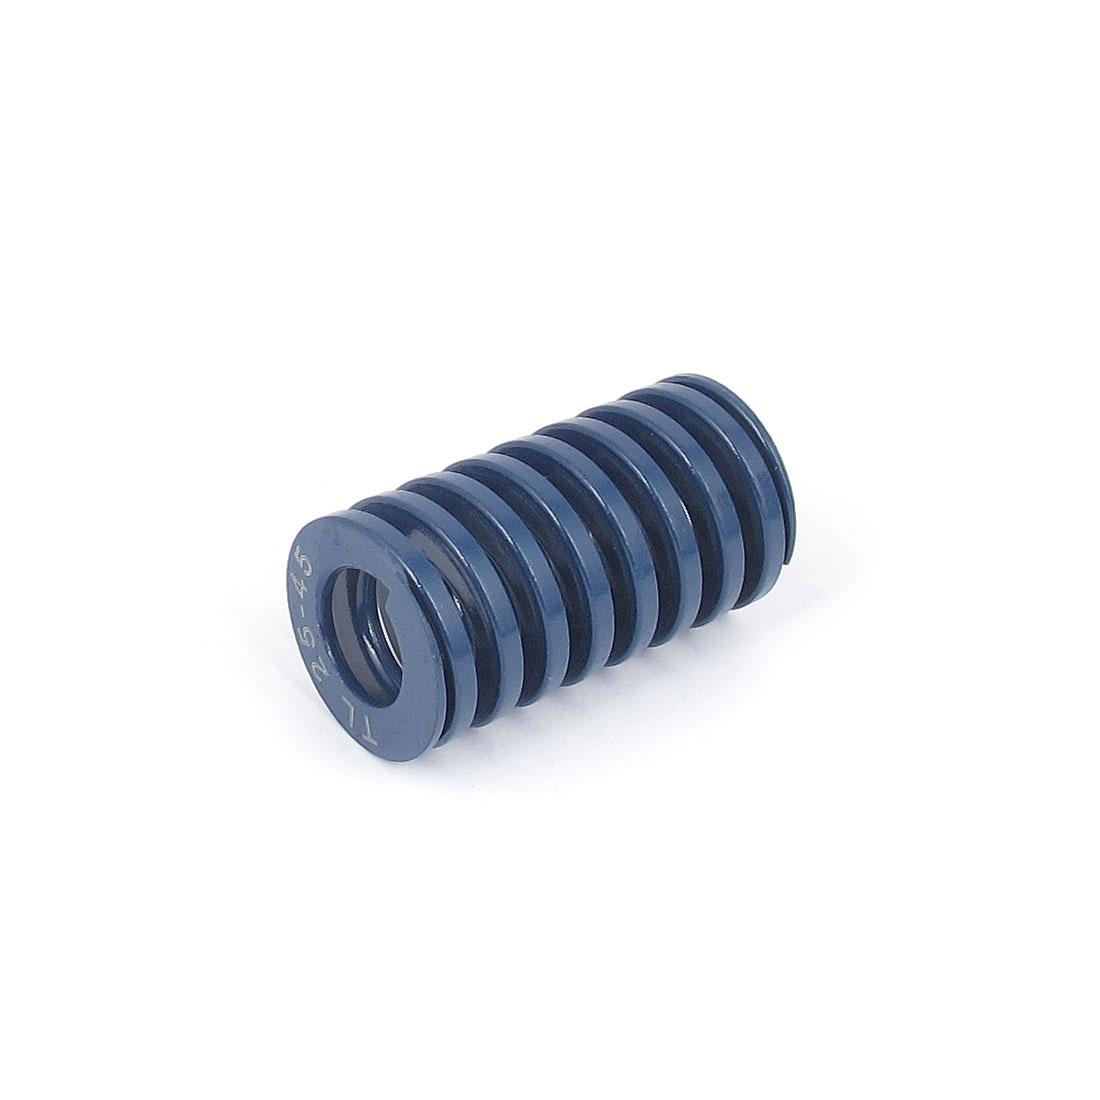 25mmx45mm Chromium Alloy Steel Light Load Die Spring Blue